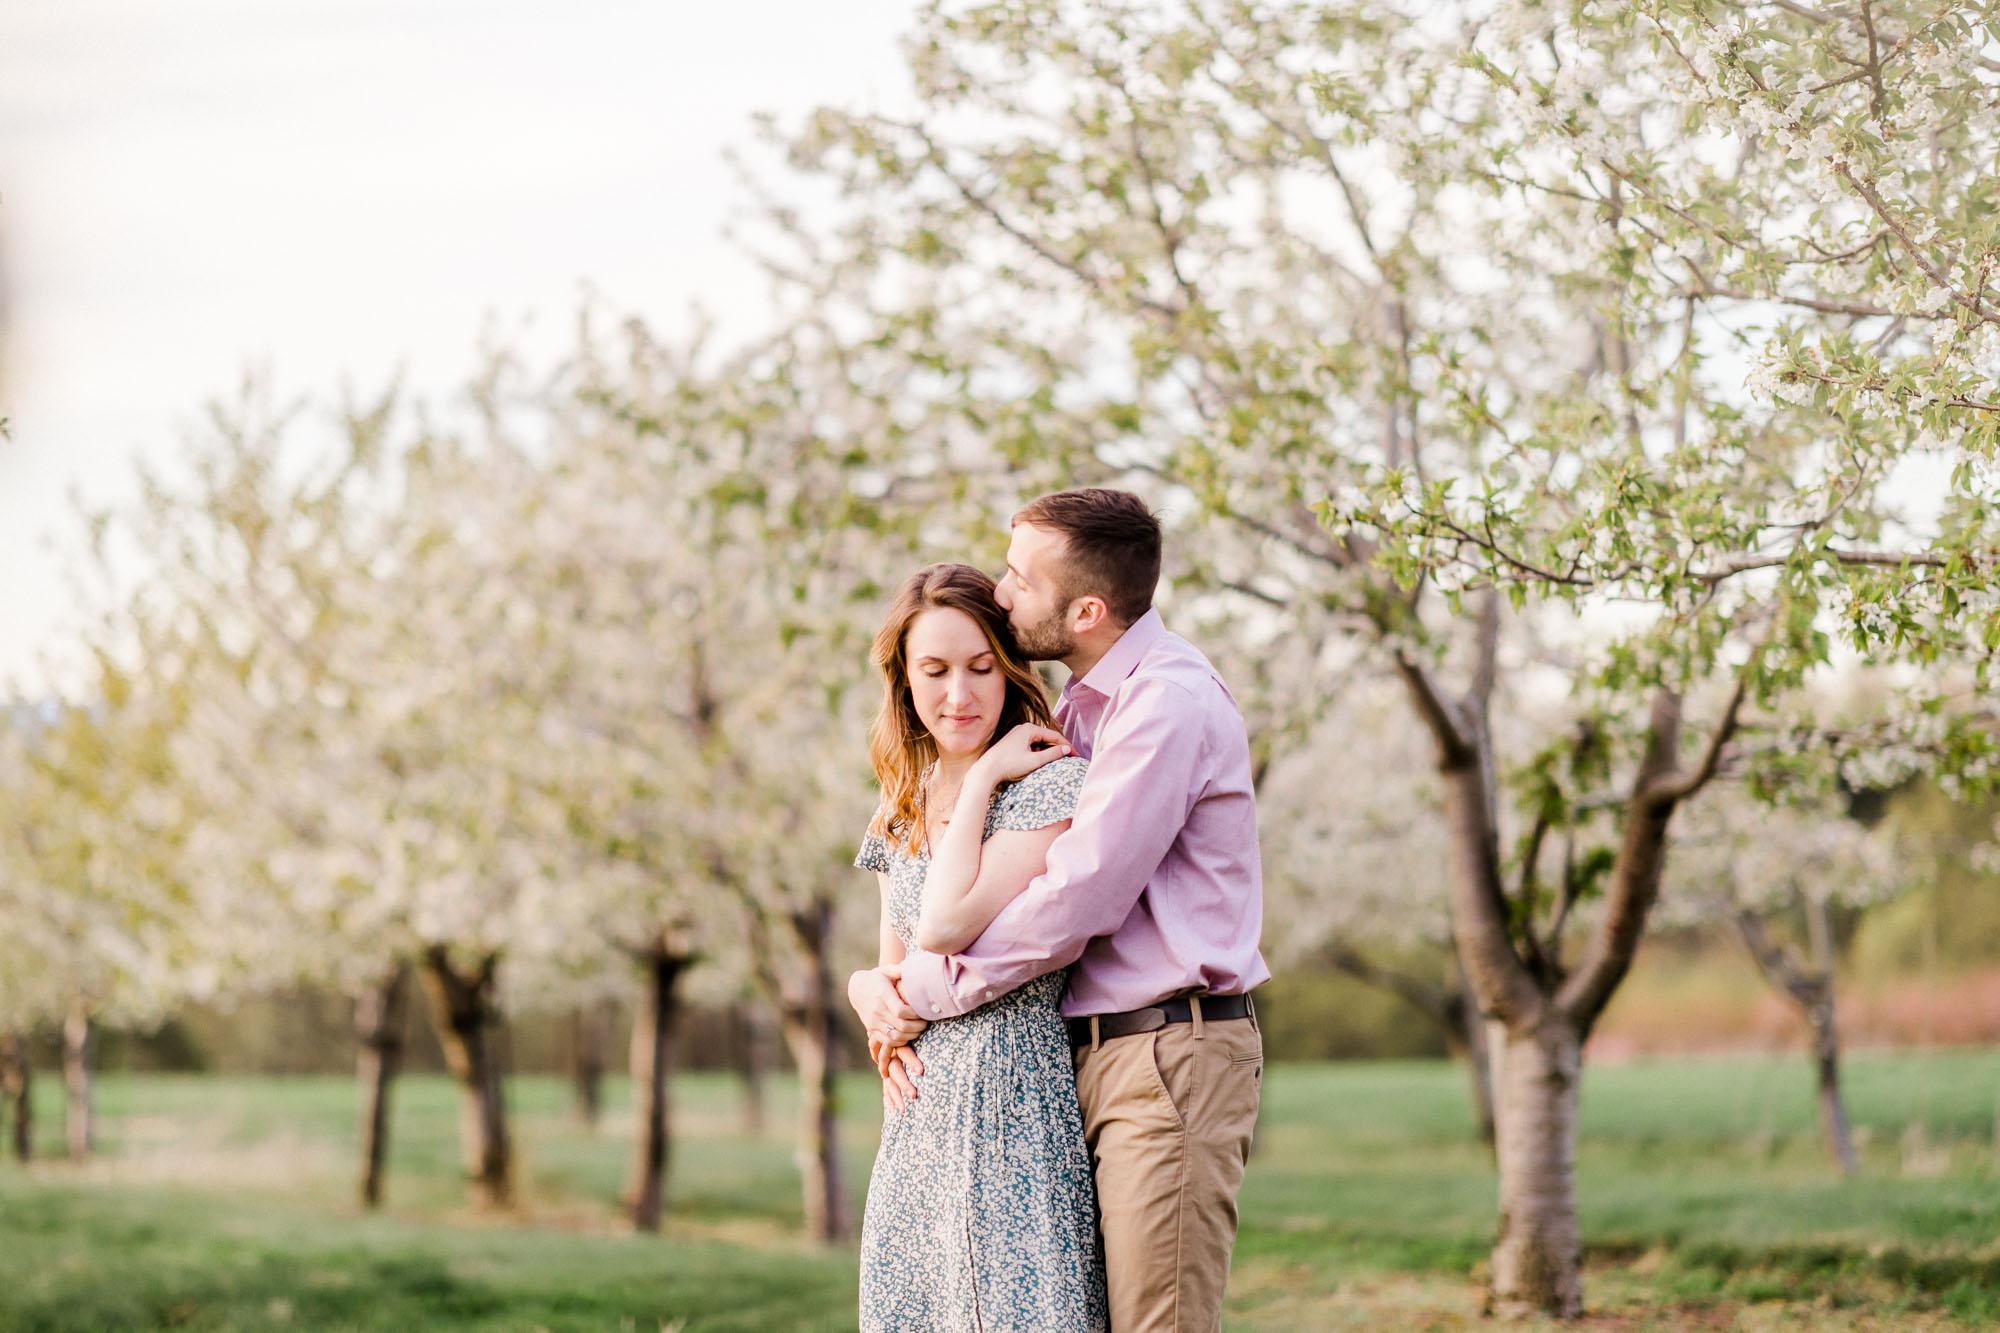 Rohrbachs-Spring-cherry-blossom-engagement-7714.jpg